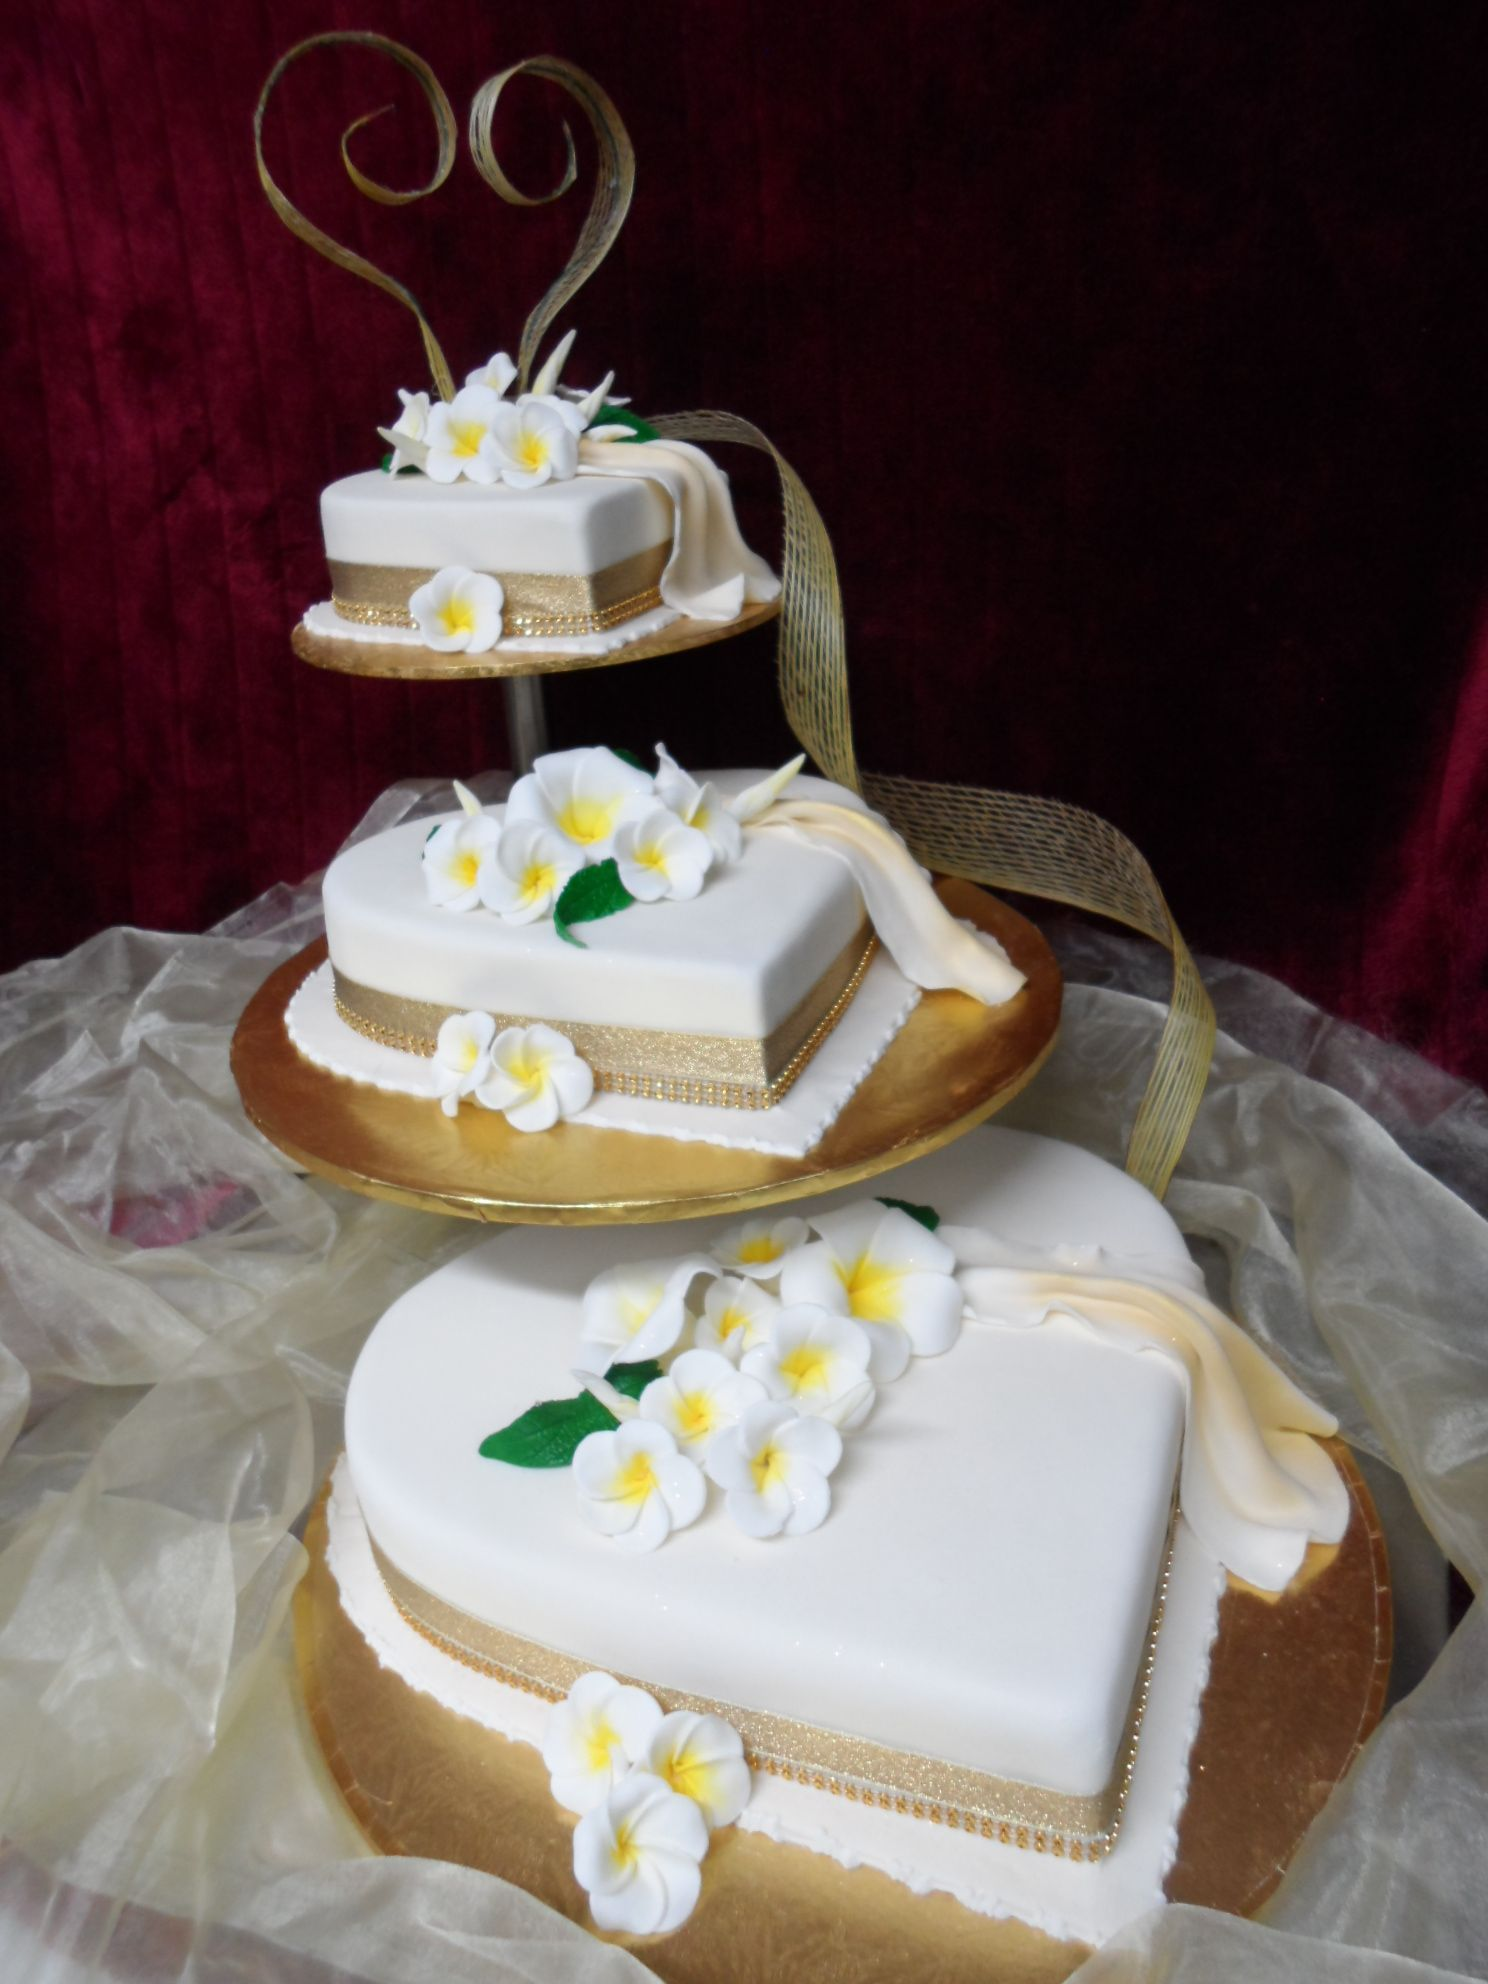 Frangipani Themed Kiwiana Heart Shaped Wedding Cake Best Cakes In Auckland New Zealand Fresco